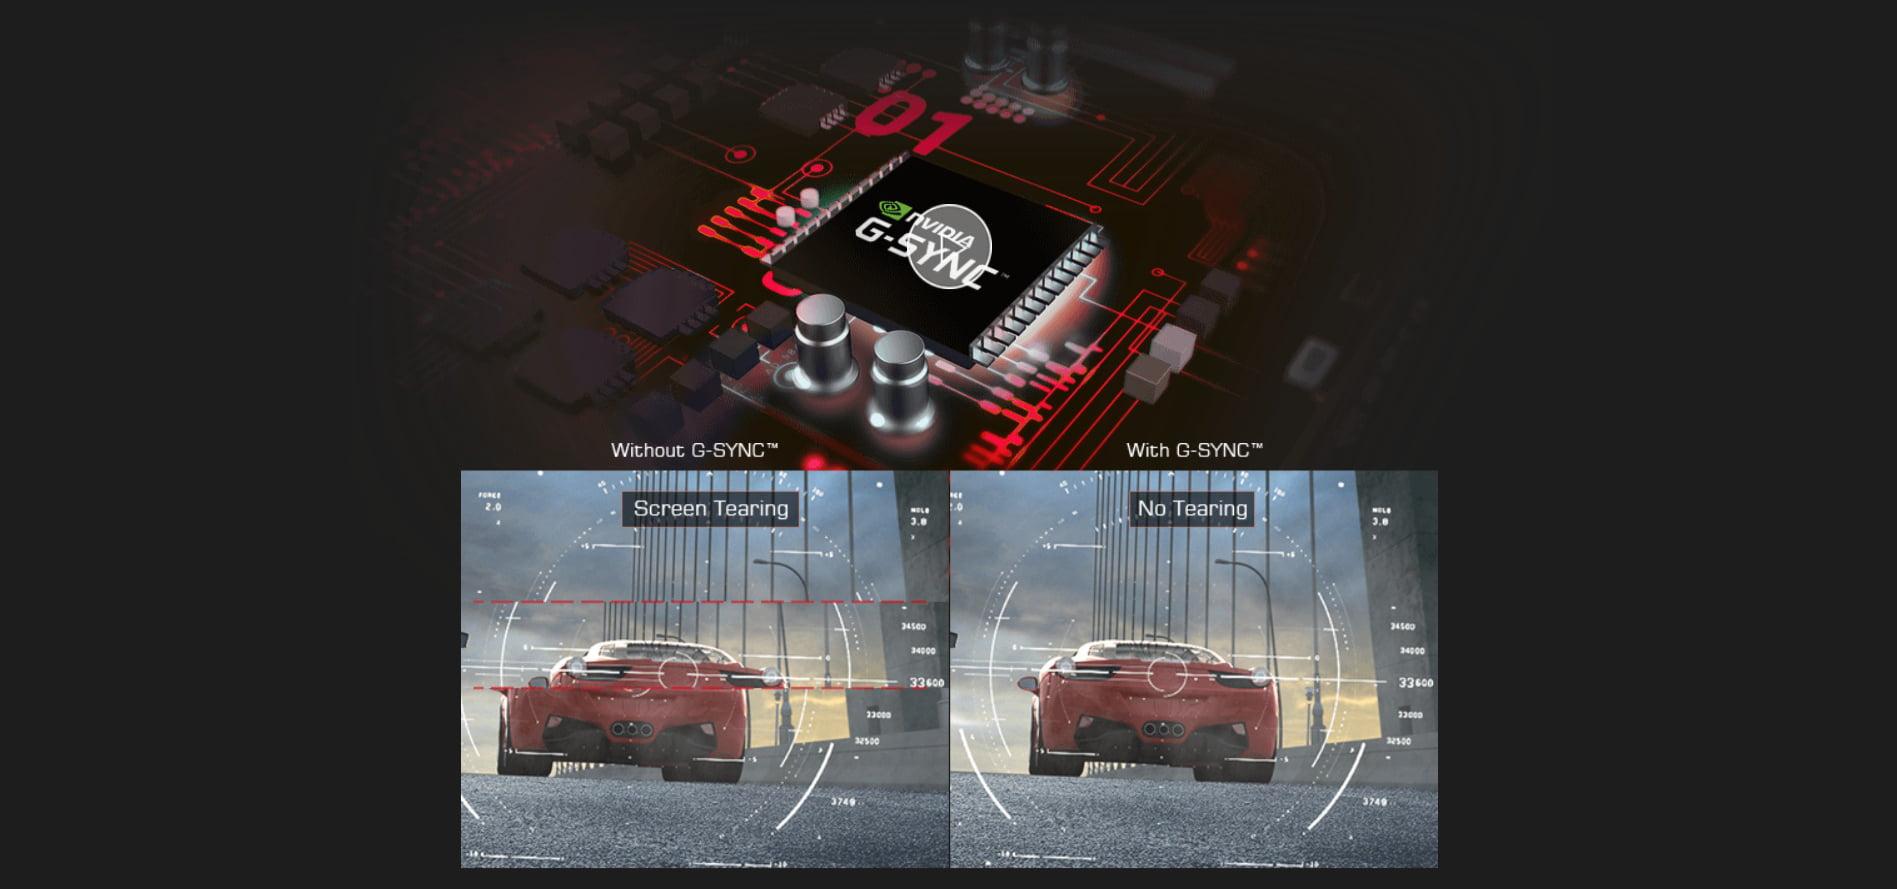 ASUS ROG Swift PG279Q Gaming Monitor – 27″ 2K WQHD – New